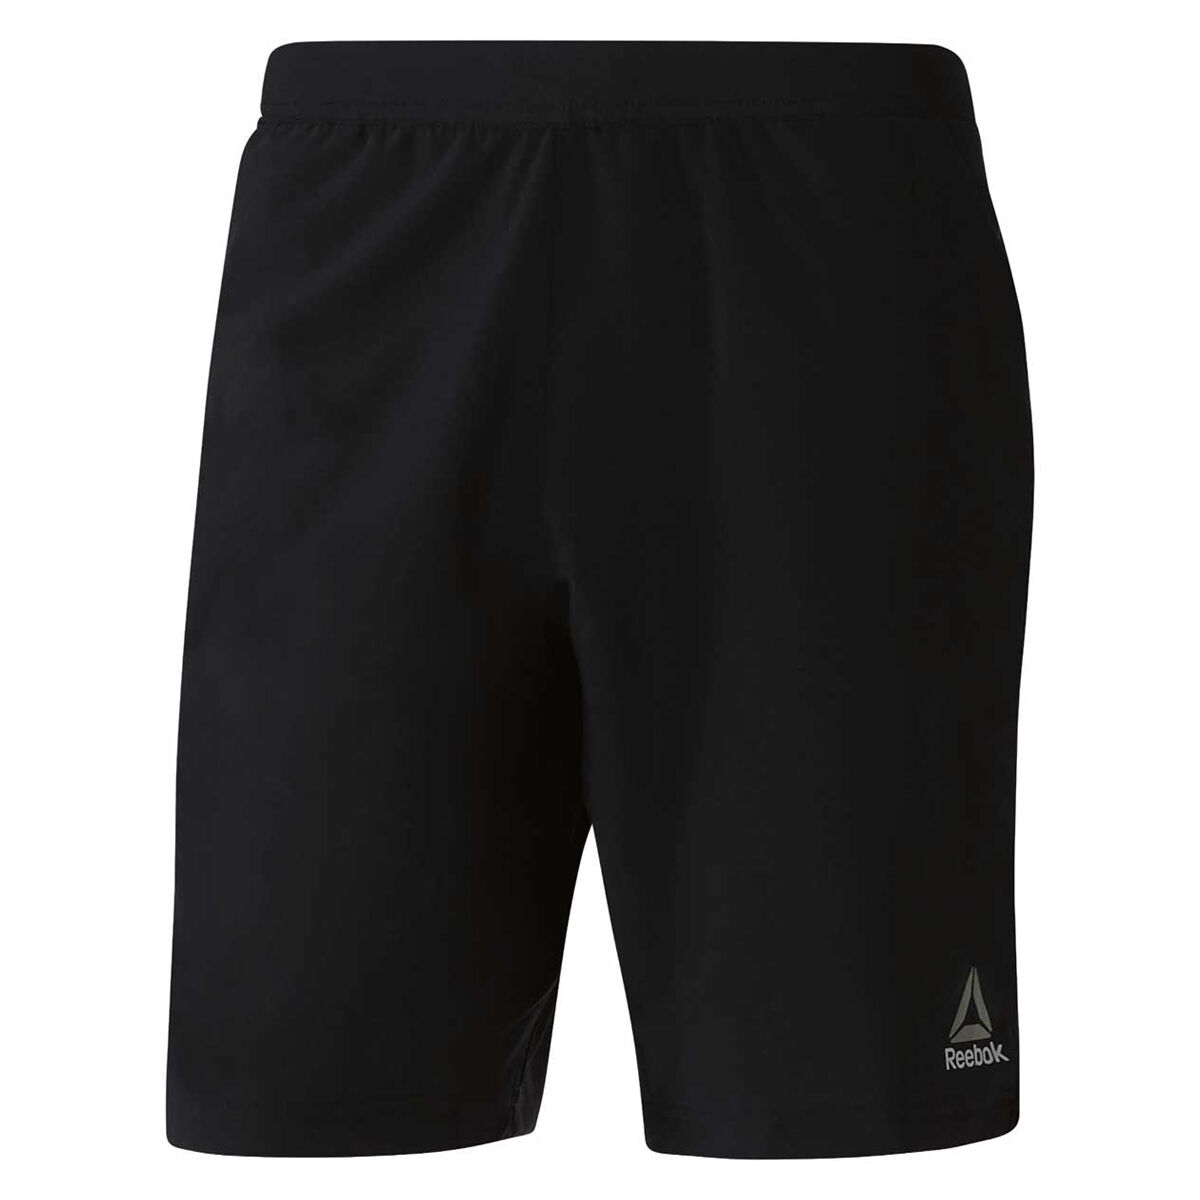 Reebok Mens Speedwick Speed Training Shorts Black M